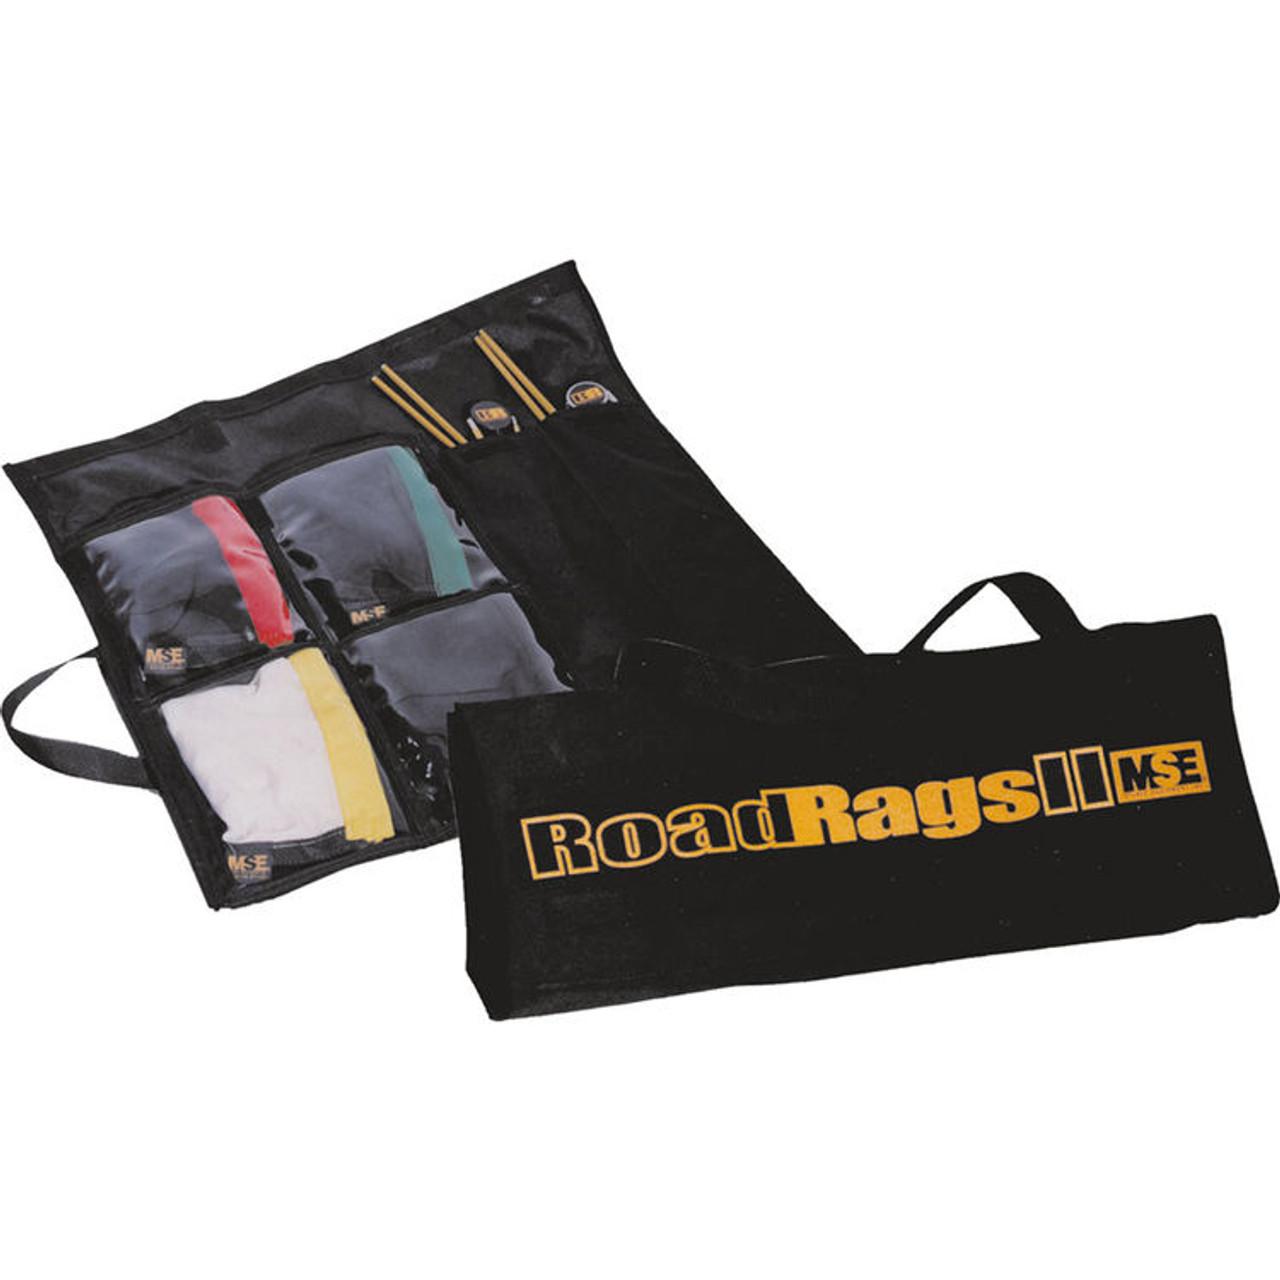 Matthews Roadrags Flag Kit (2 Holders 4 Fabrics)